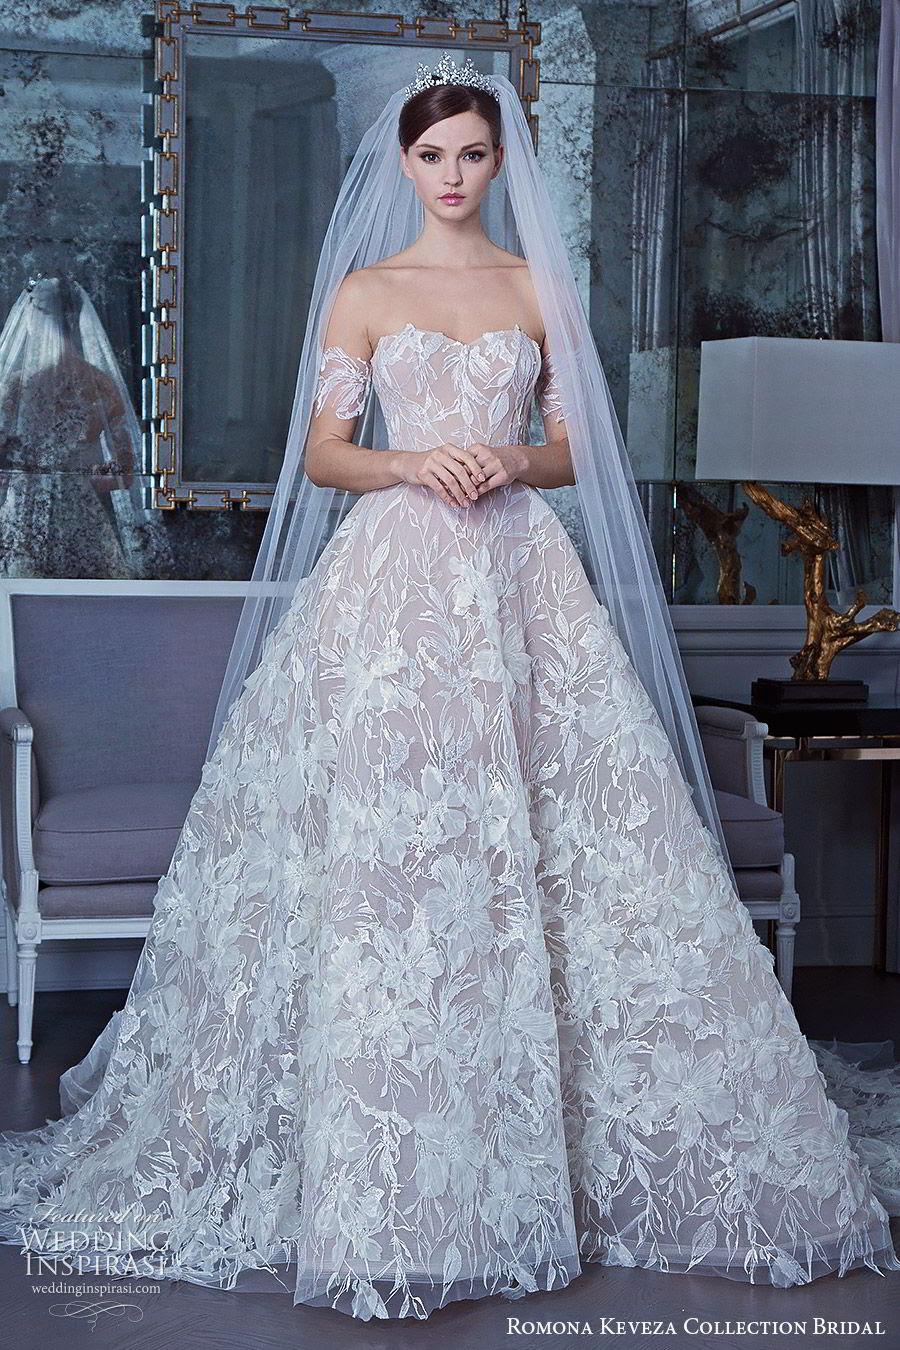 romona keveza collection bridal fall 2019 wedding dresses